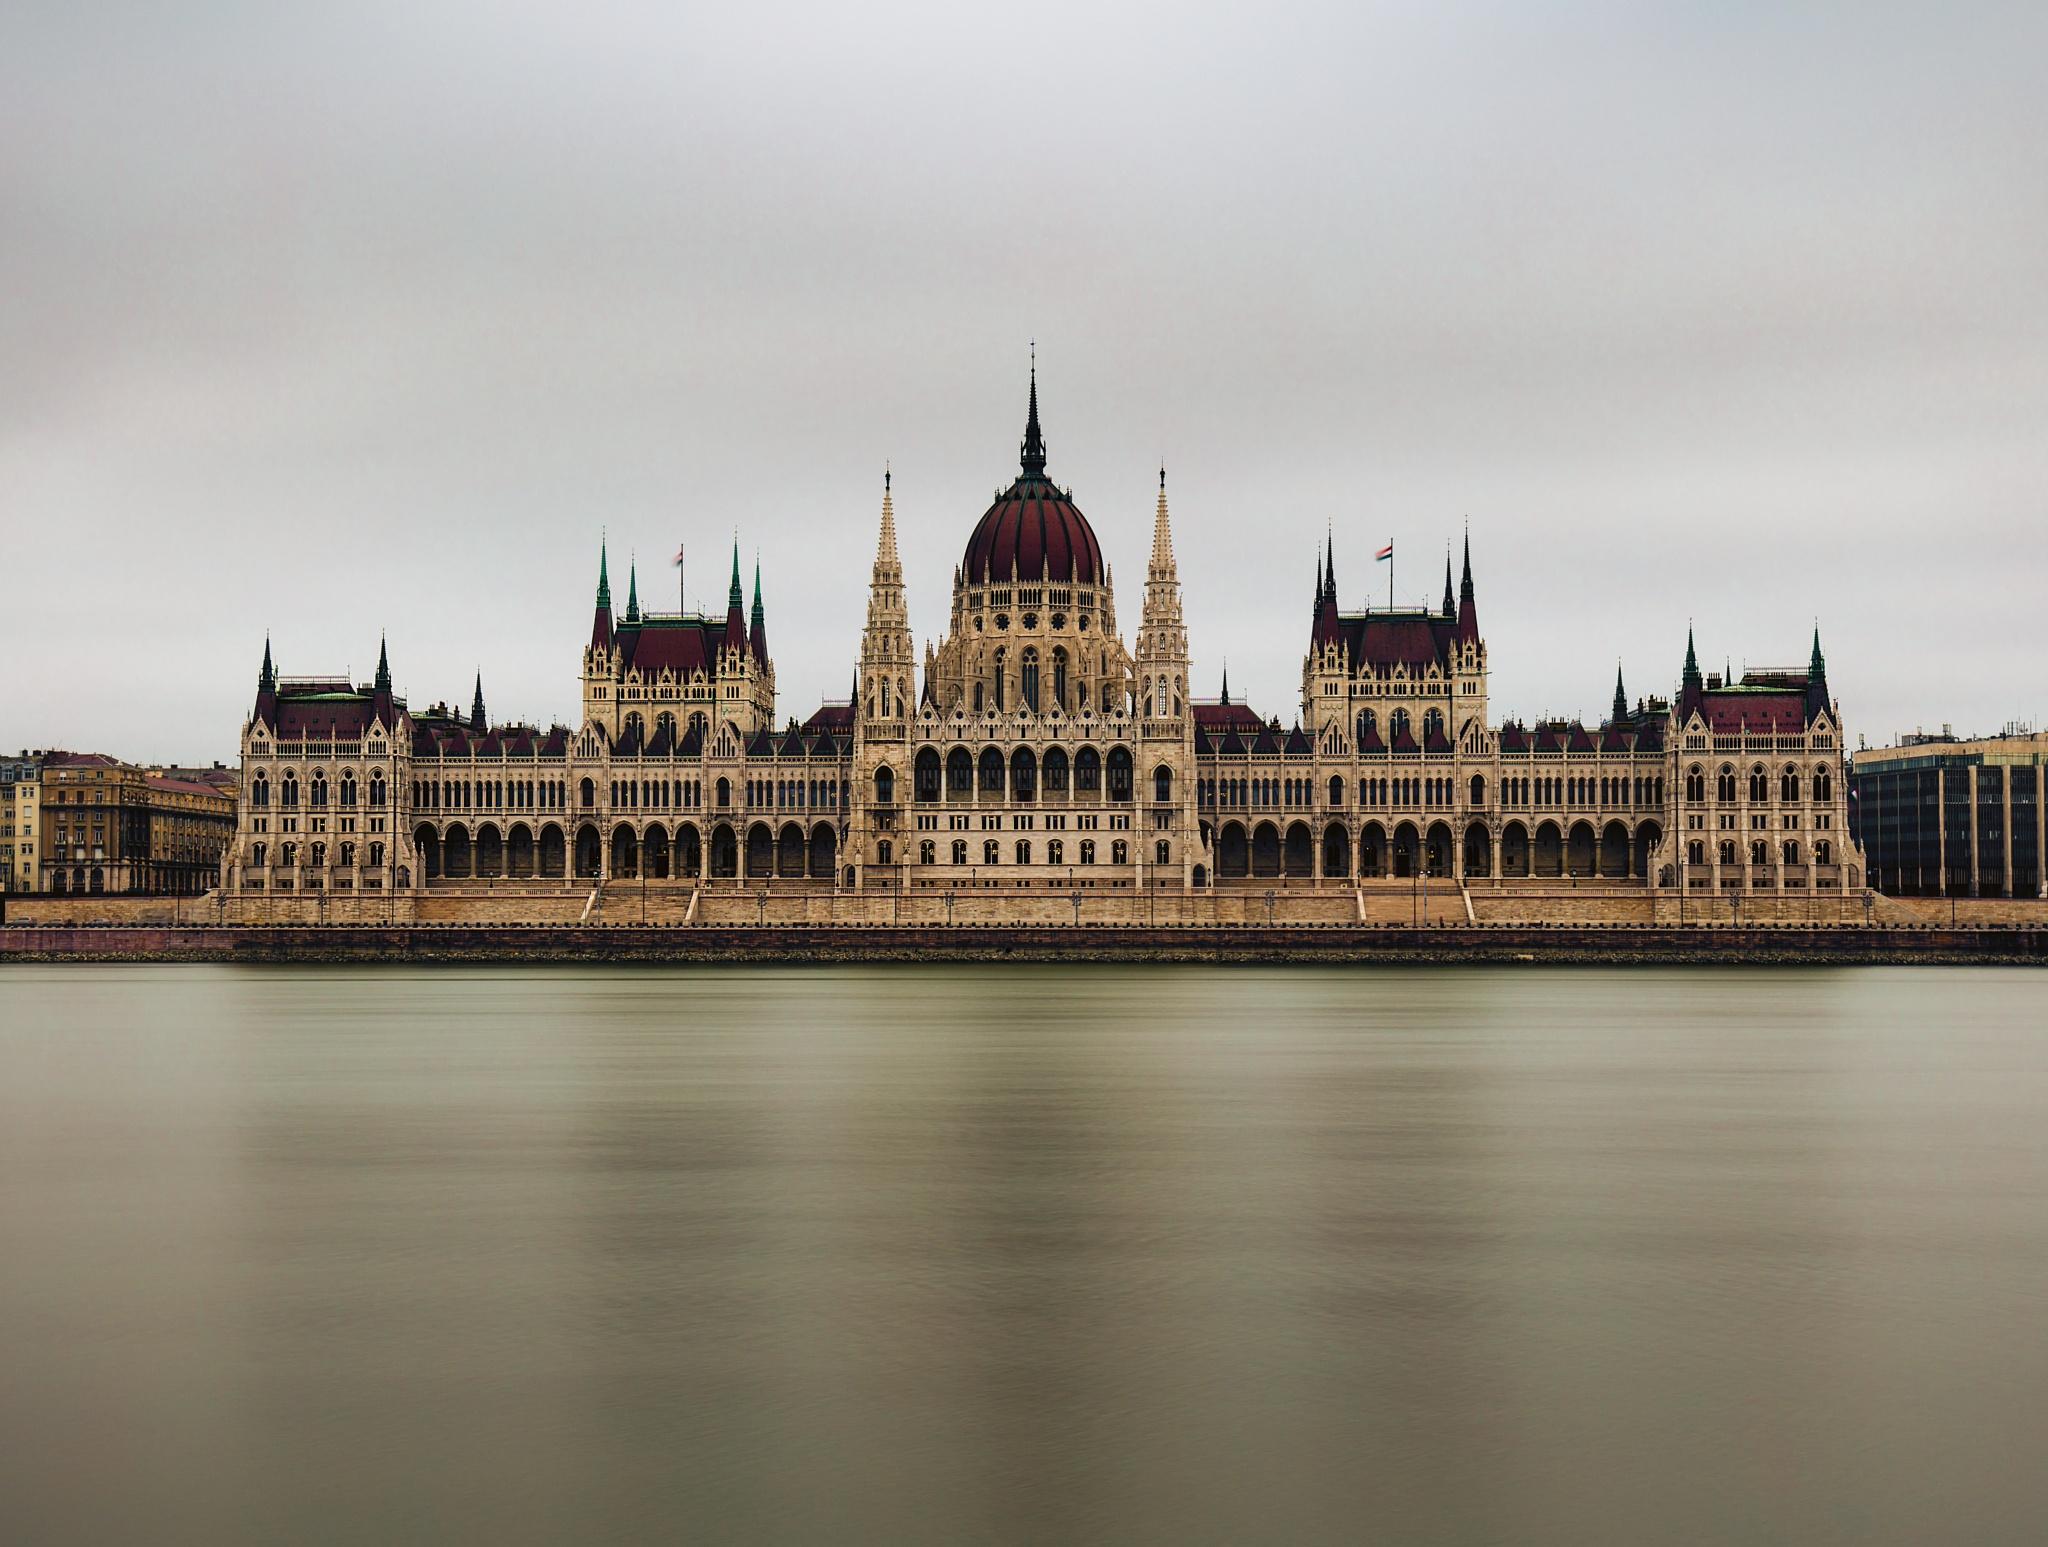 Parliament House by bob55